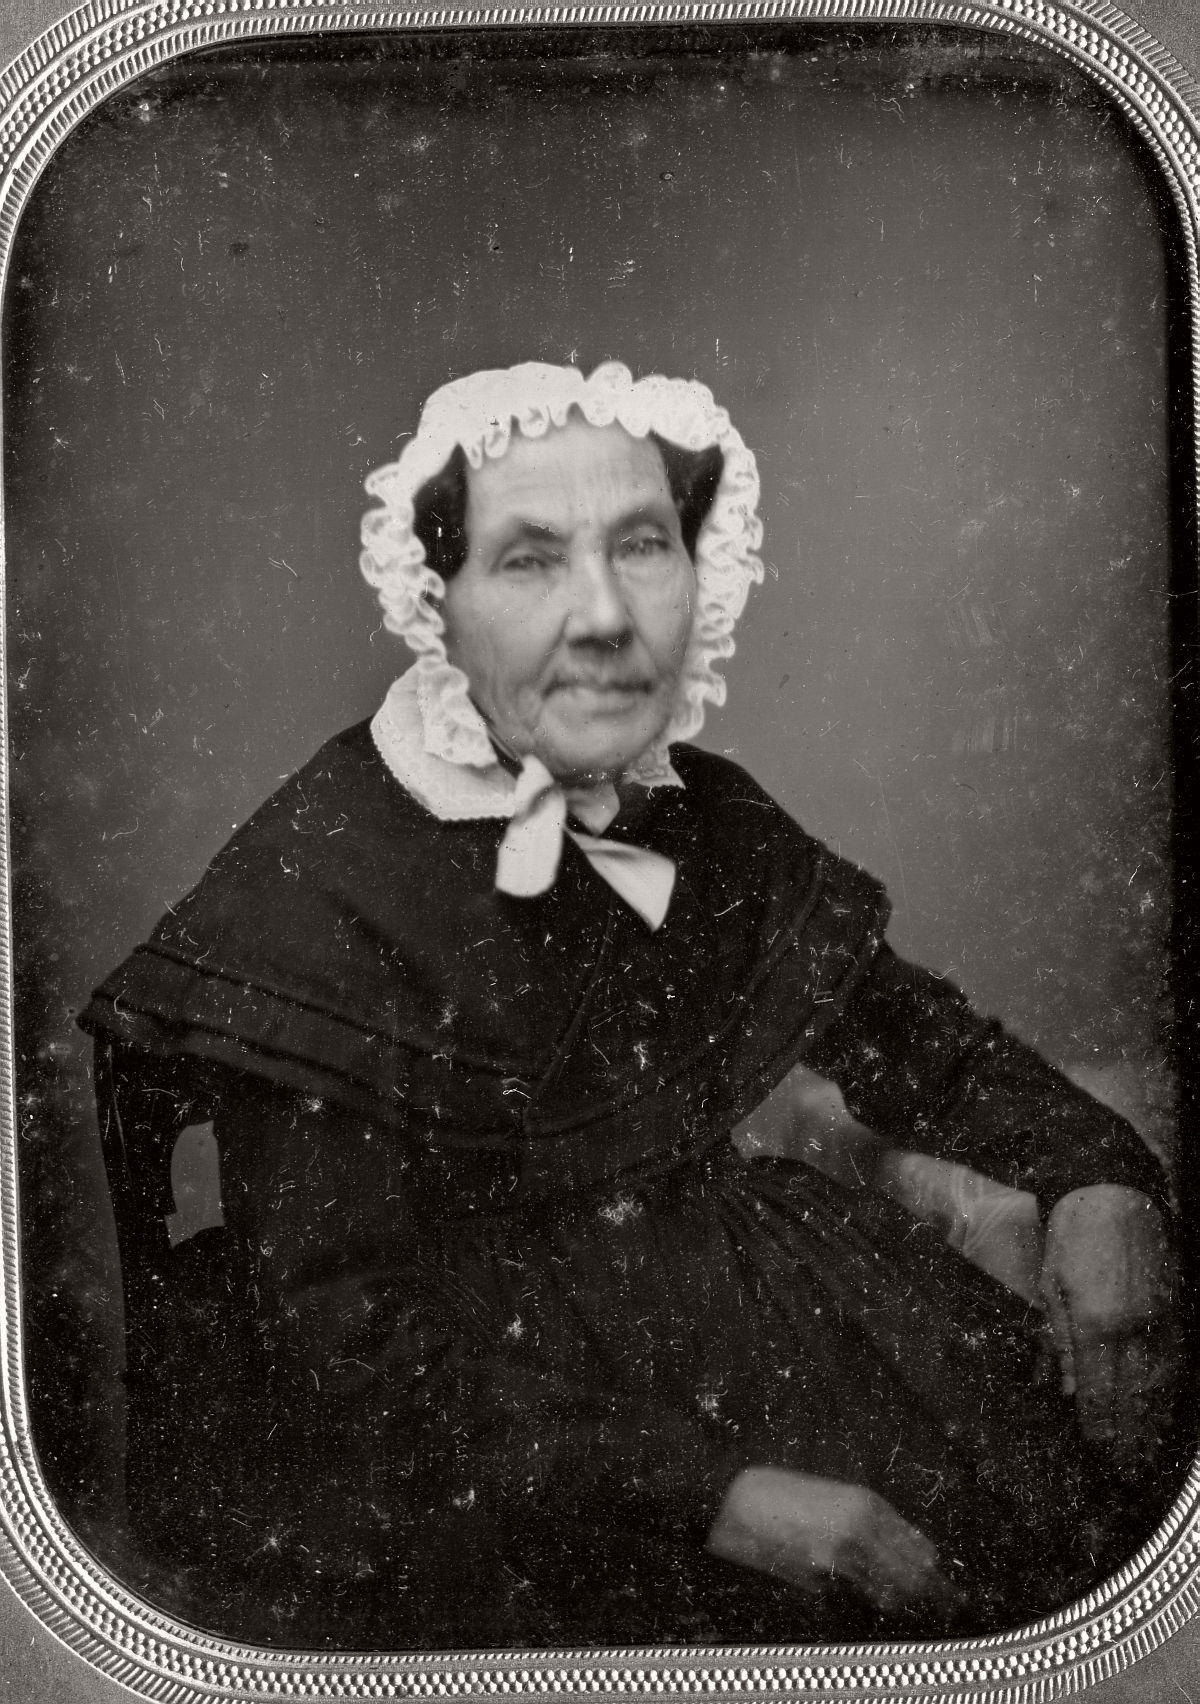 daguerreotype-portrait-ladies-born-in-the-late-18th-century-1700s-vintage-06